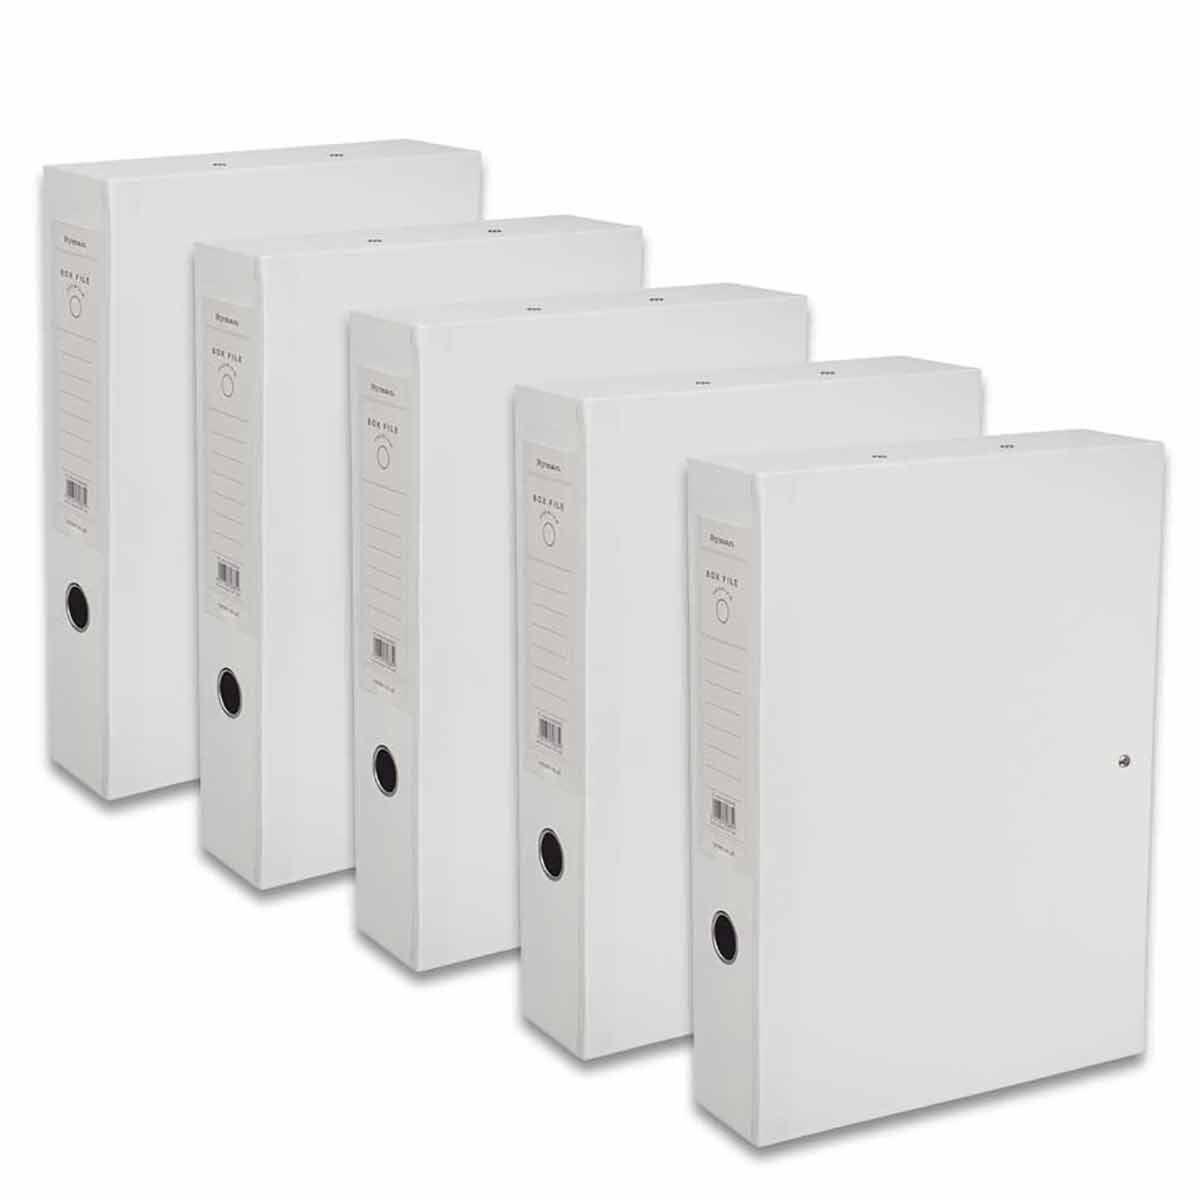 Ryman Premium Box File Foolscap Pack of 5 White